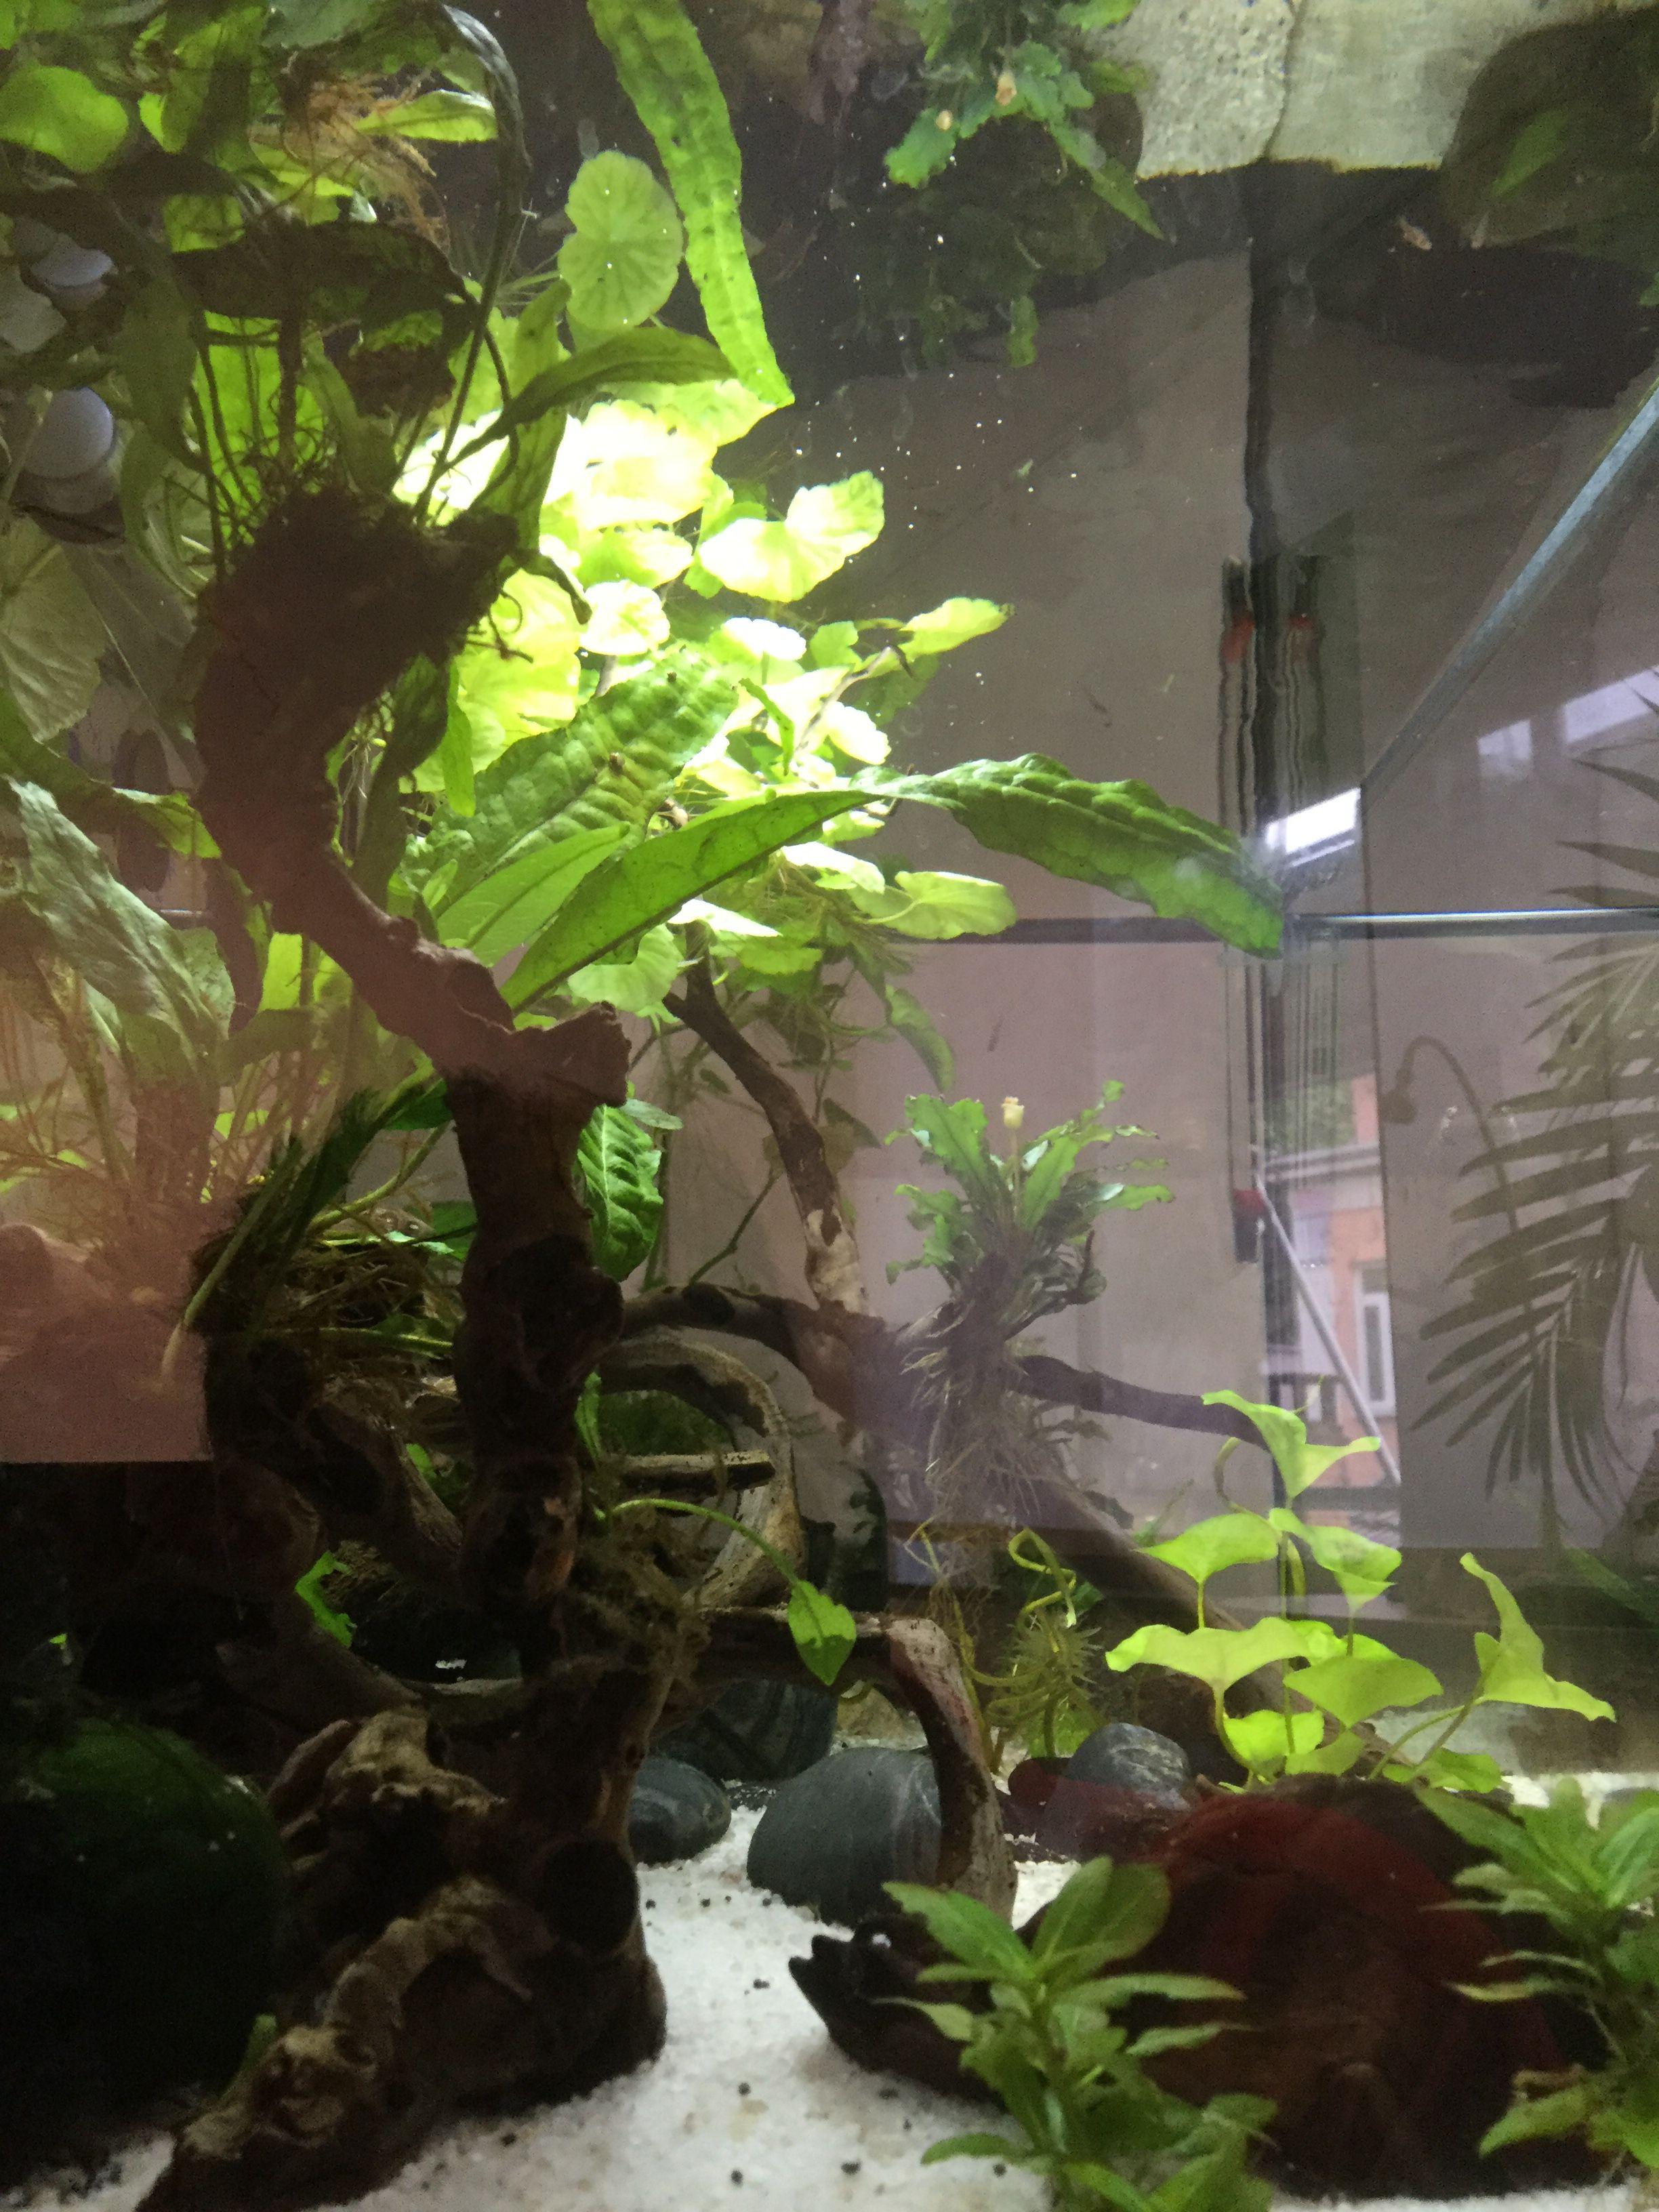 Pin by marlize oberholster on akwarium goed pinterest aquariums